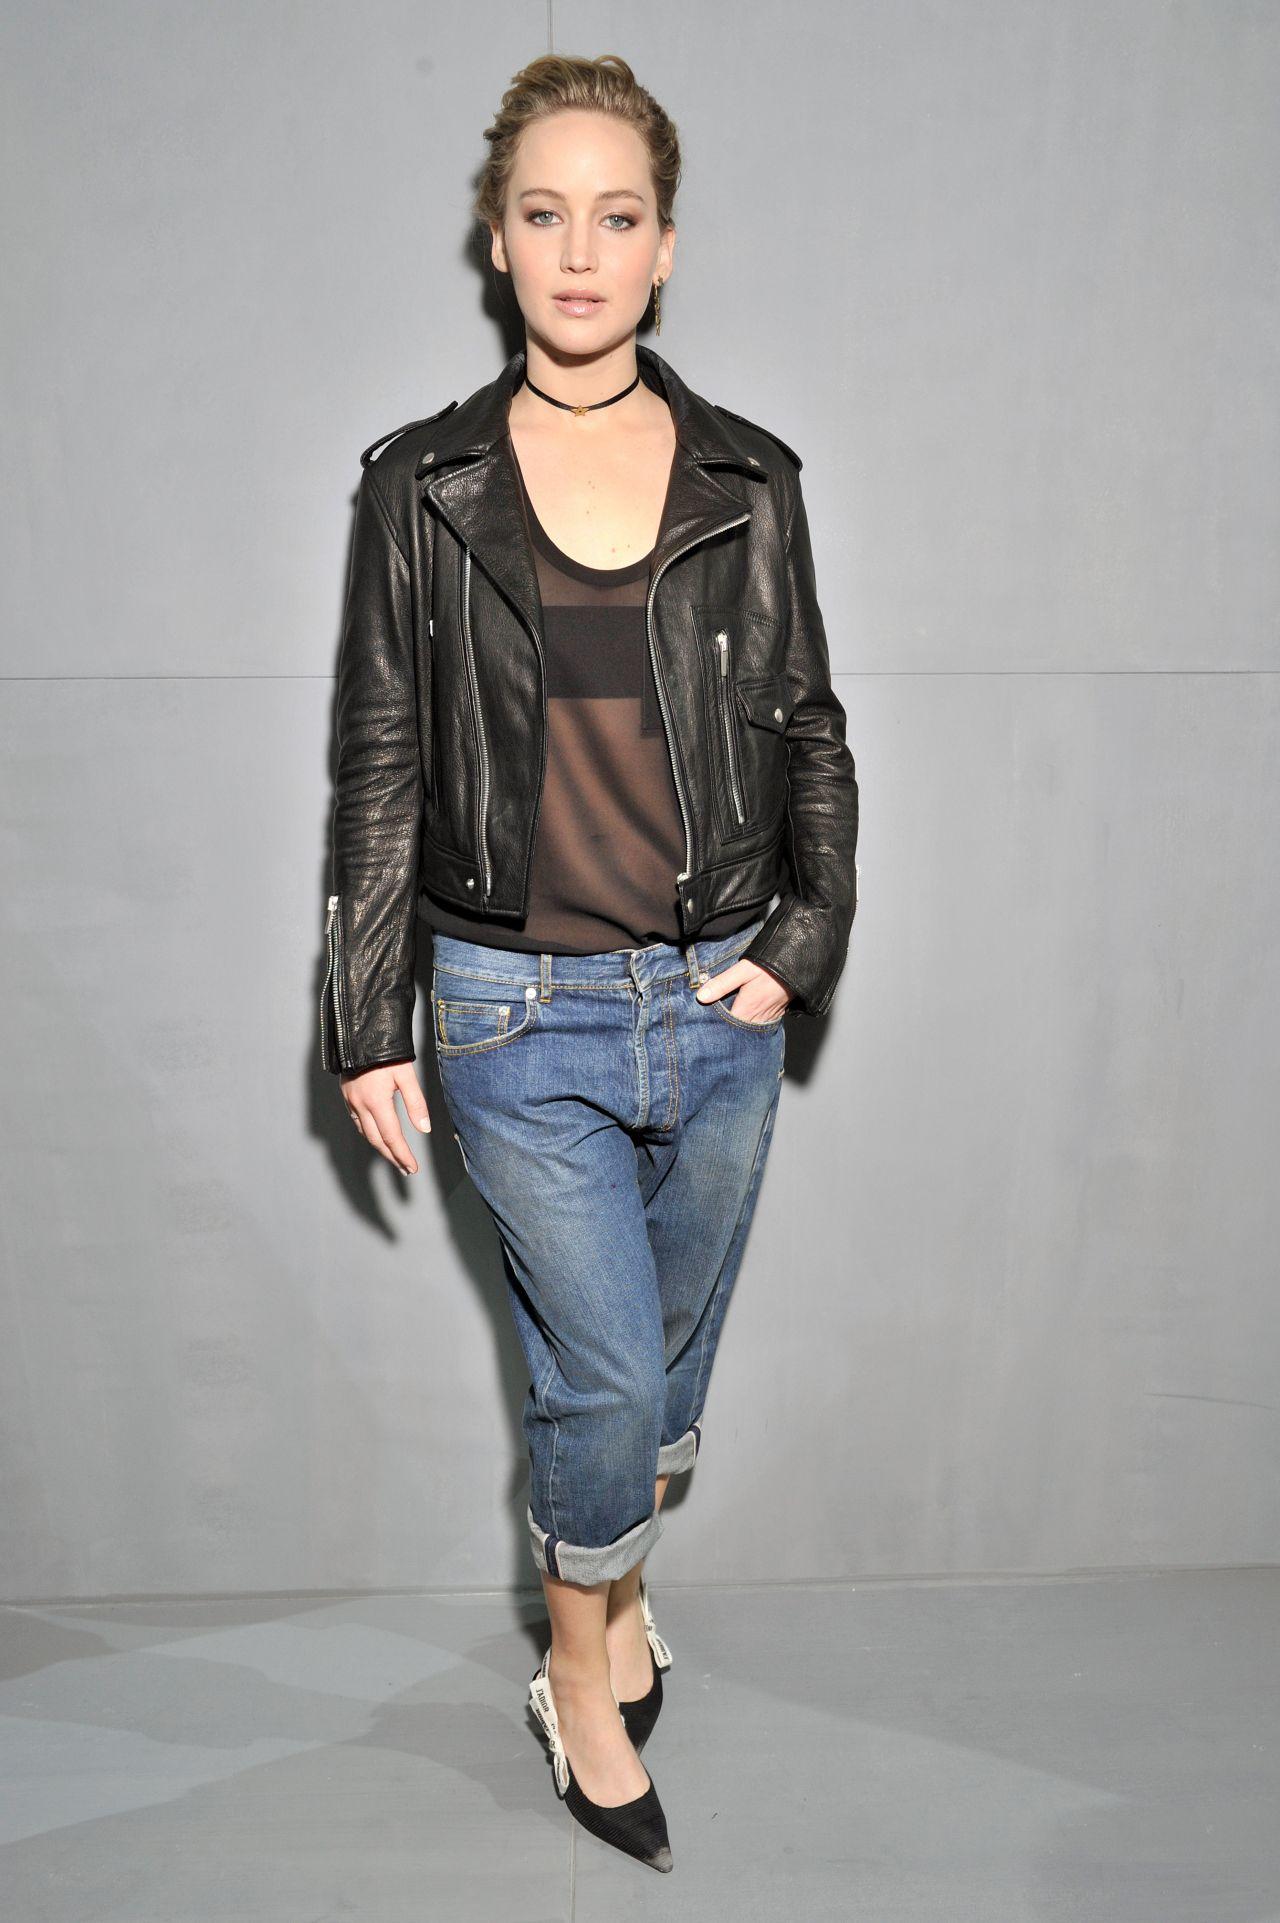 Jennifer Lawrence Christian Dior Show At Paris Fashion